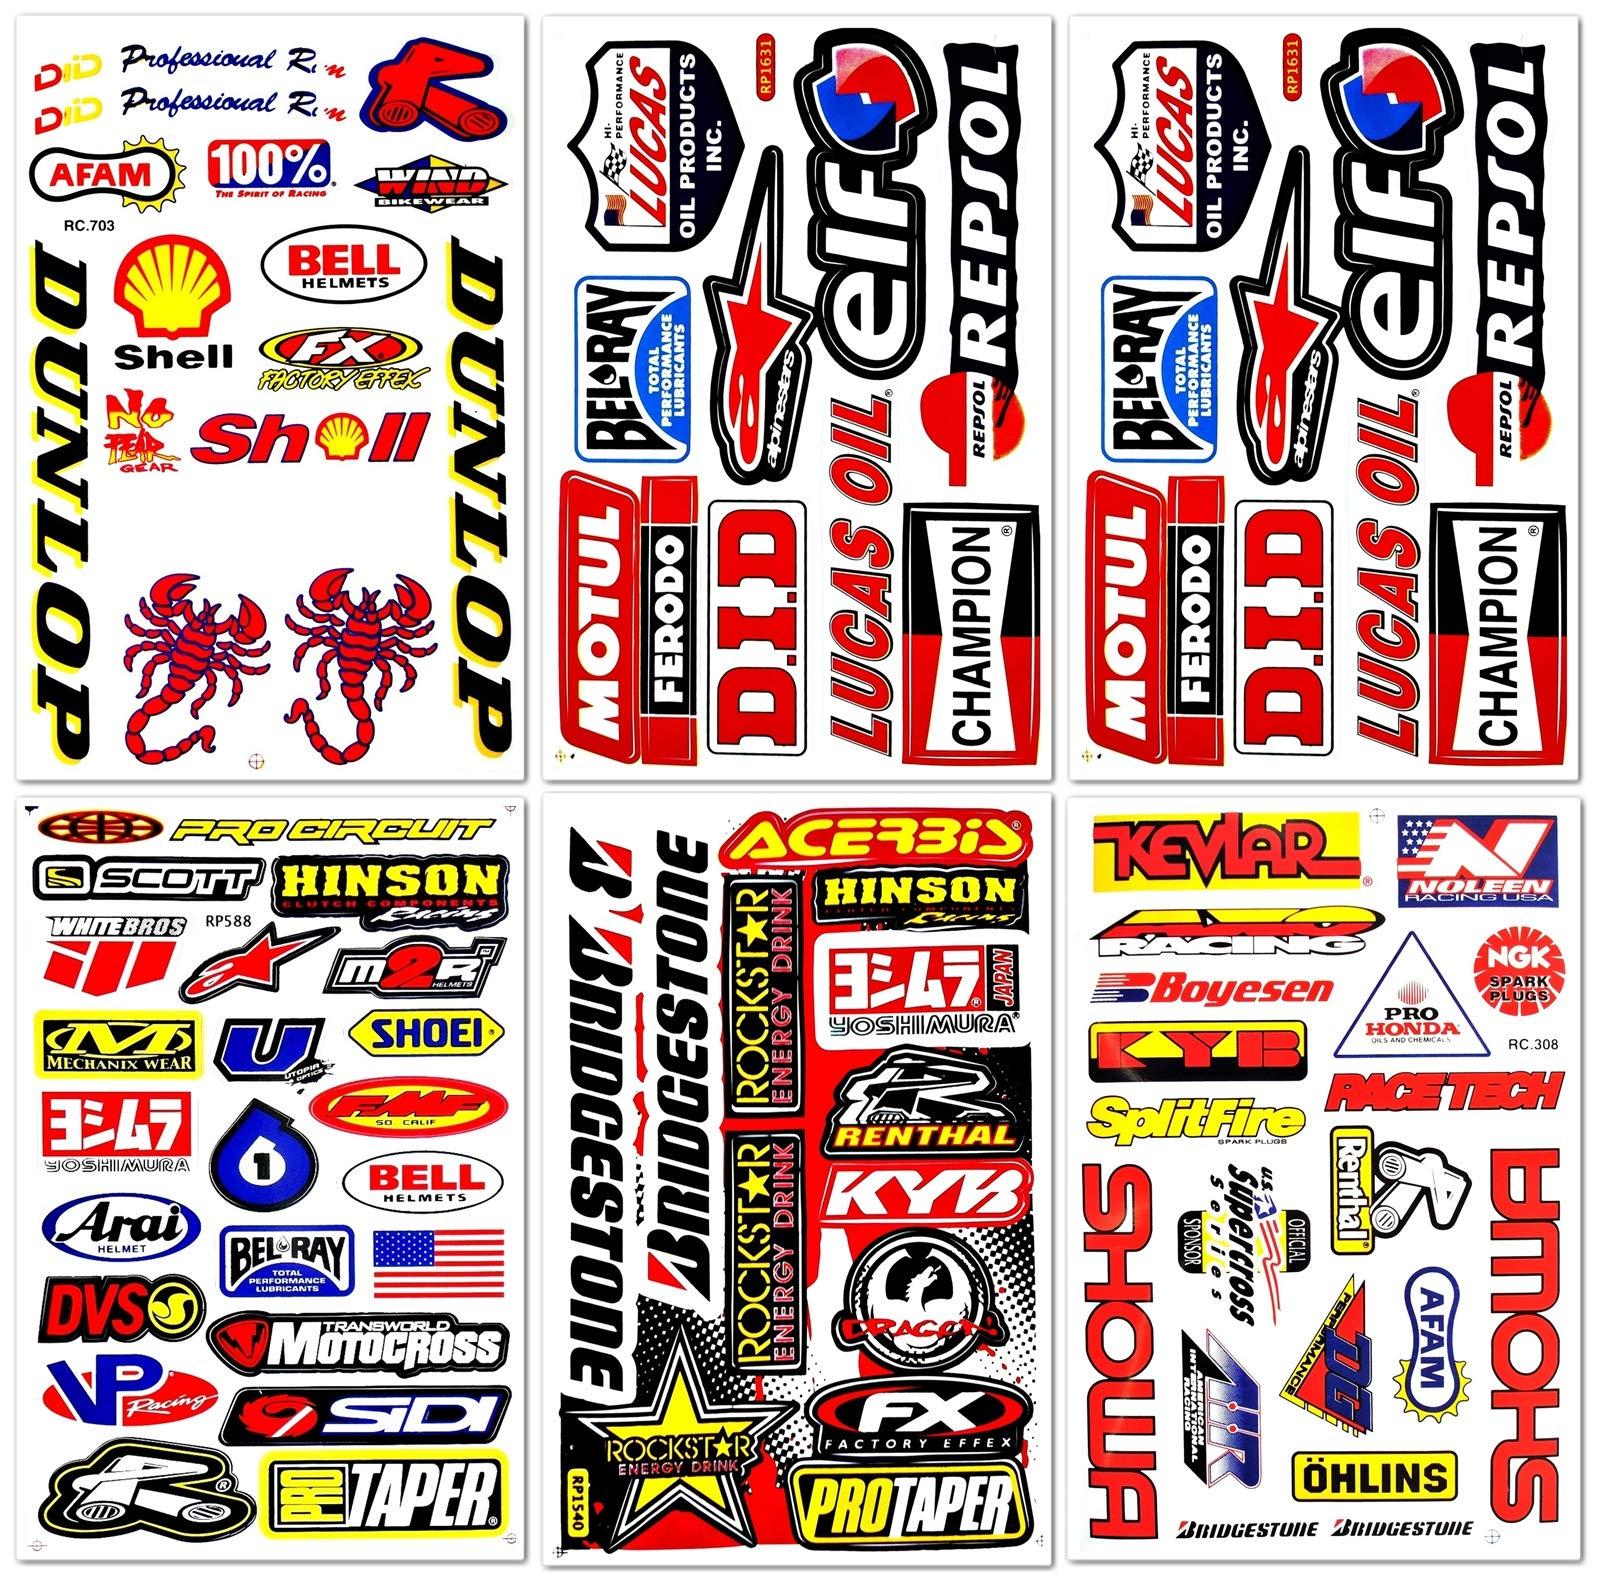 Dirt Bike Motorcycles Supercross Motocross ATV Lot 6 vinyl decals stickers D6015